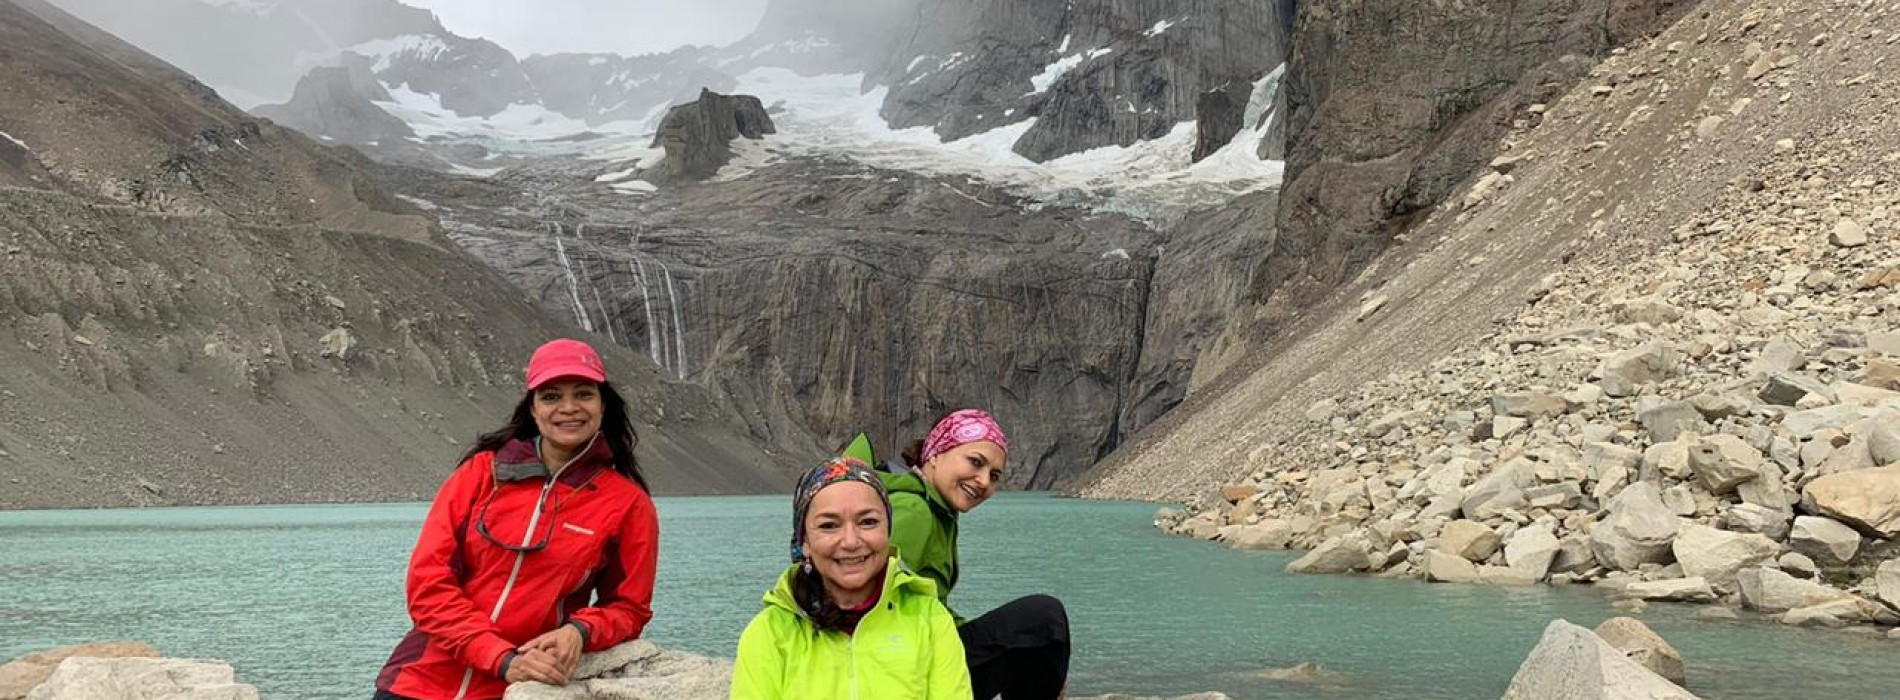 High Class Meets High Altitudes: Meet Seema Jindal Jajodia, the businesswoman scaling new heights